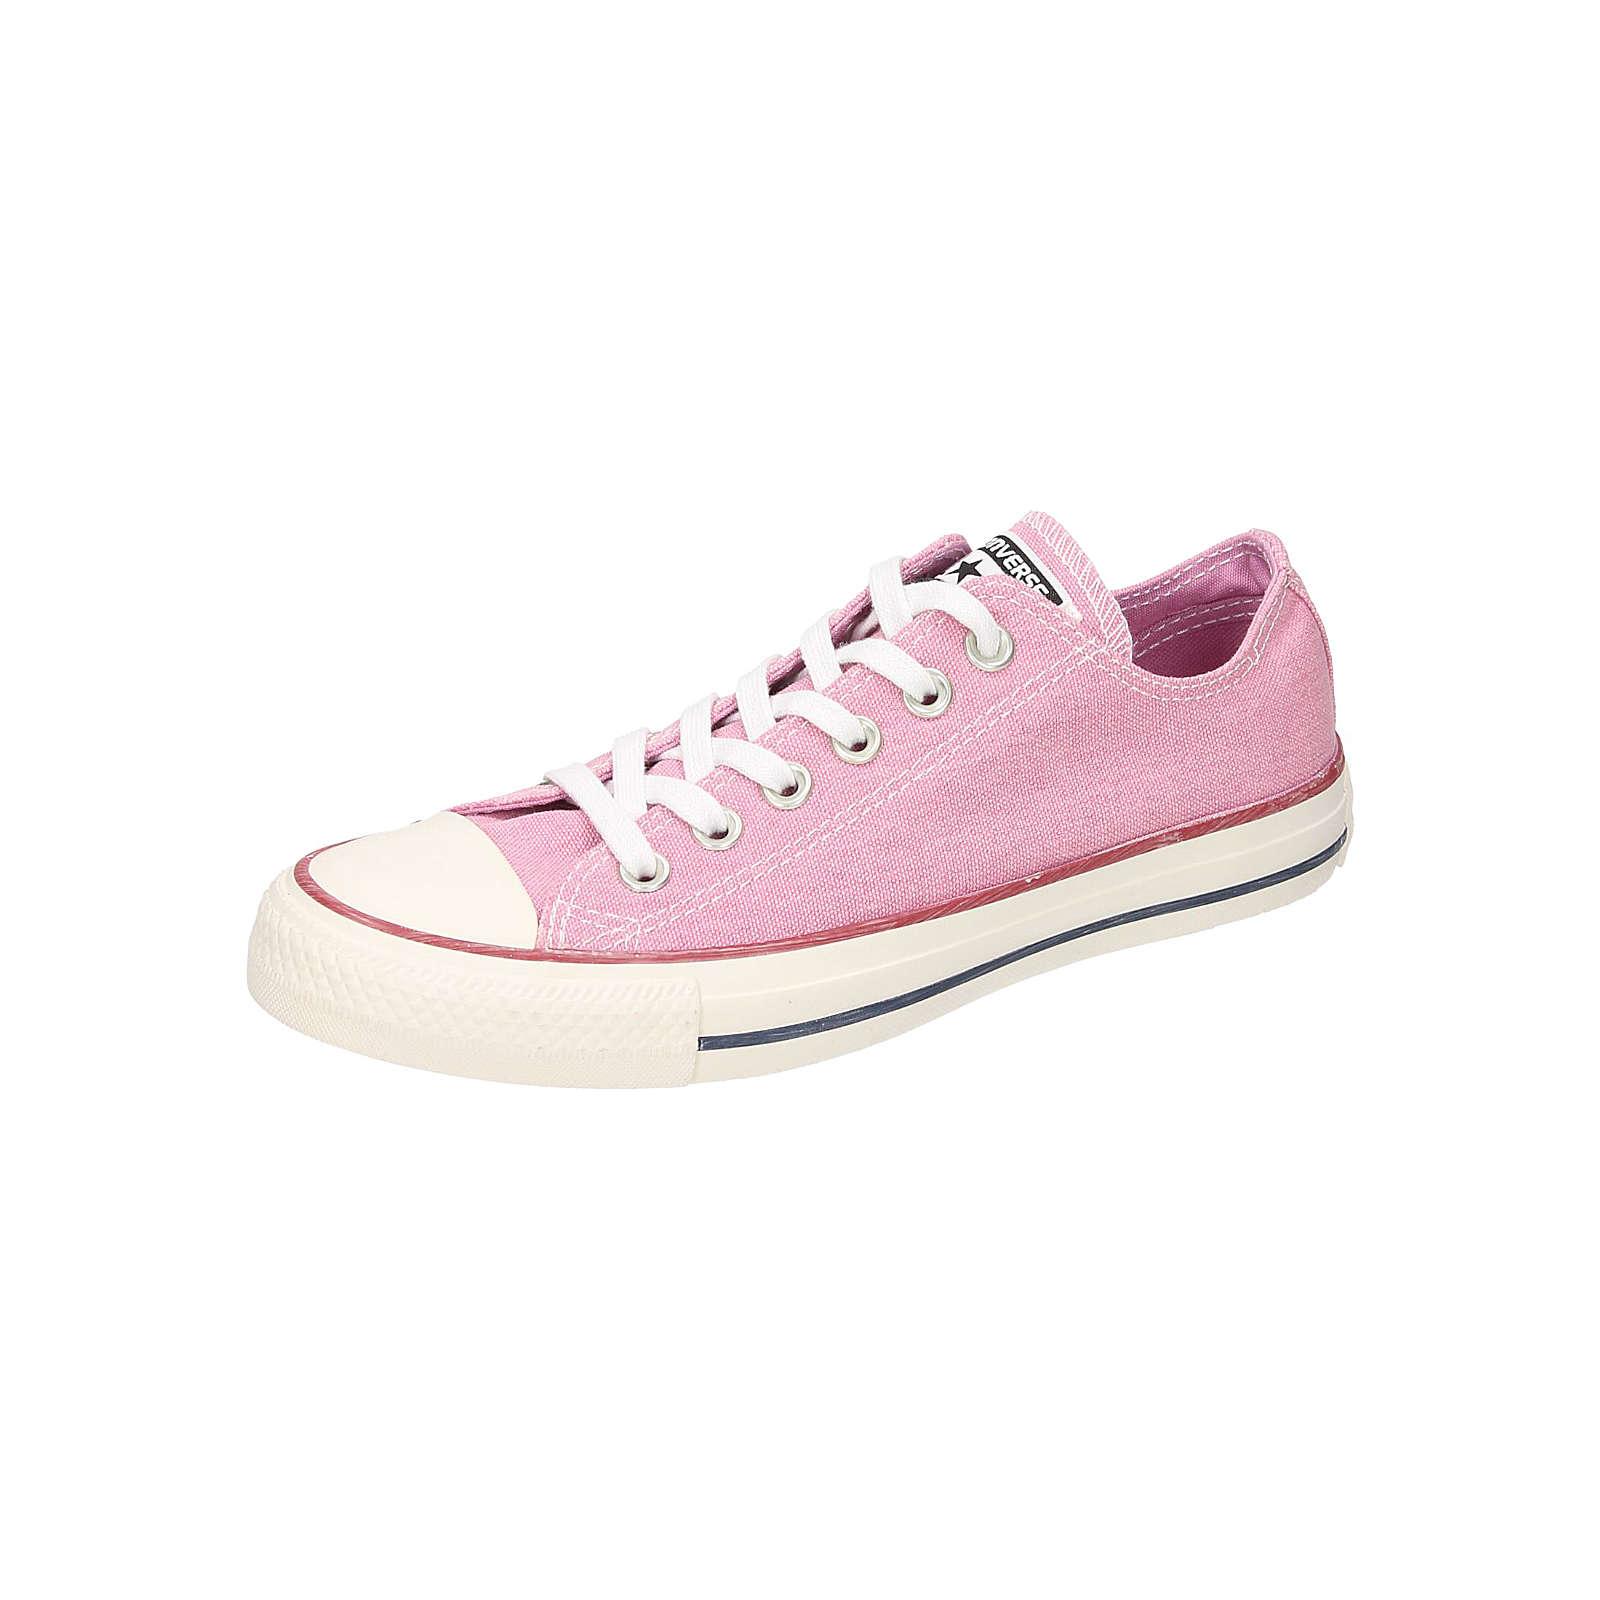 0b88ae1811c7df Rabatt-Preisvergleich.de - Schuhe   Taschen   Damenschuhe   Sneakers